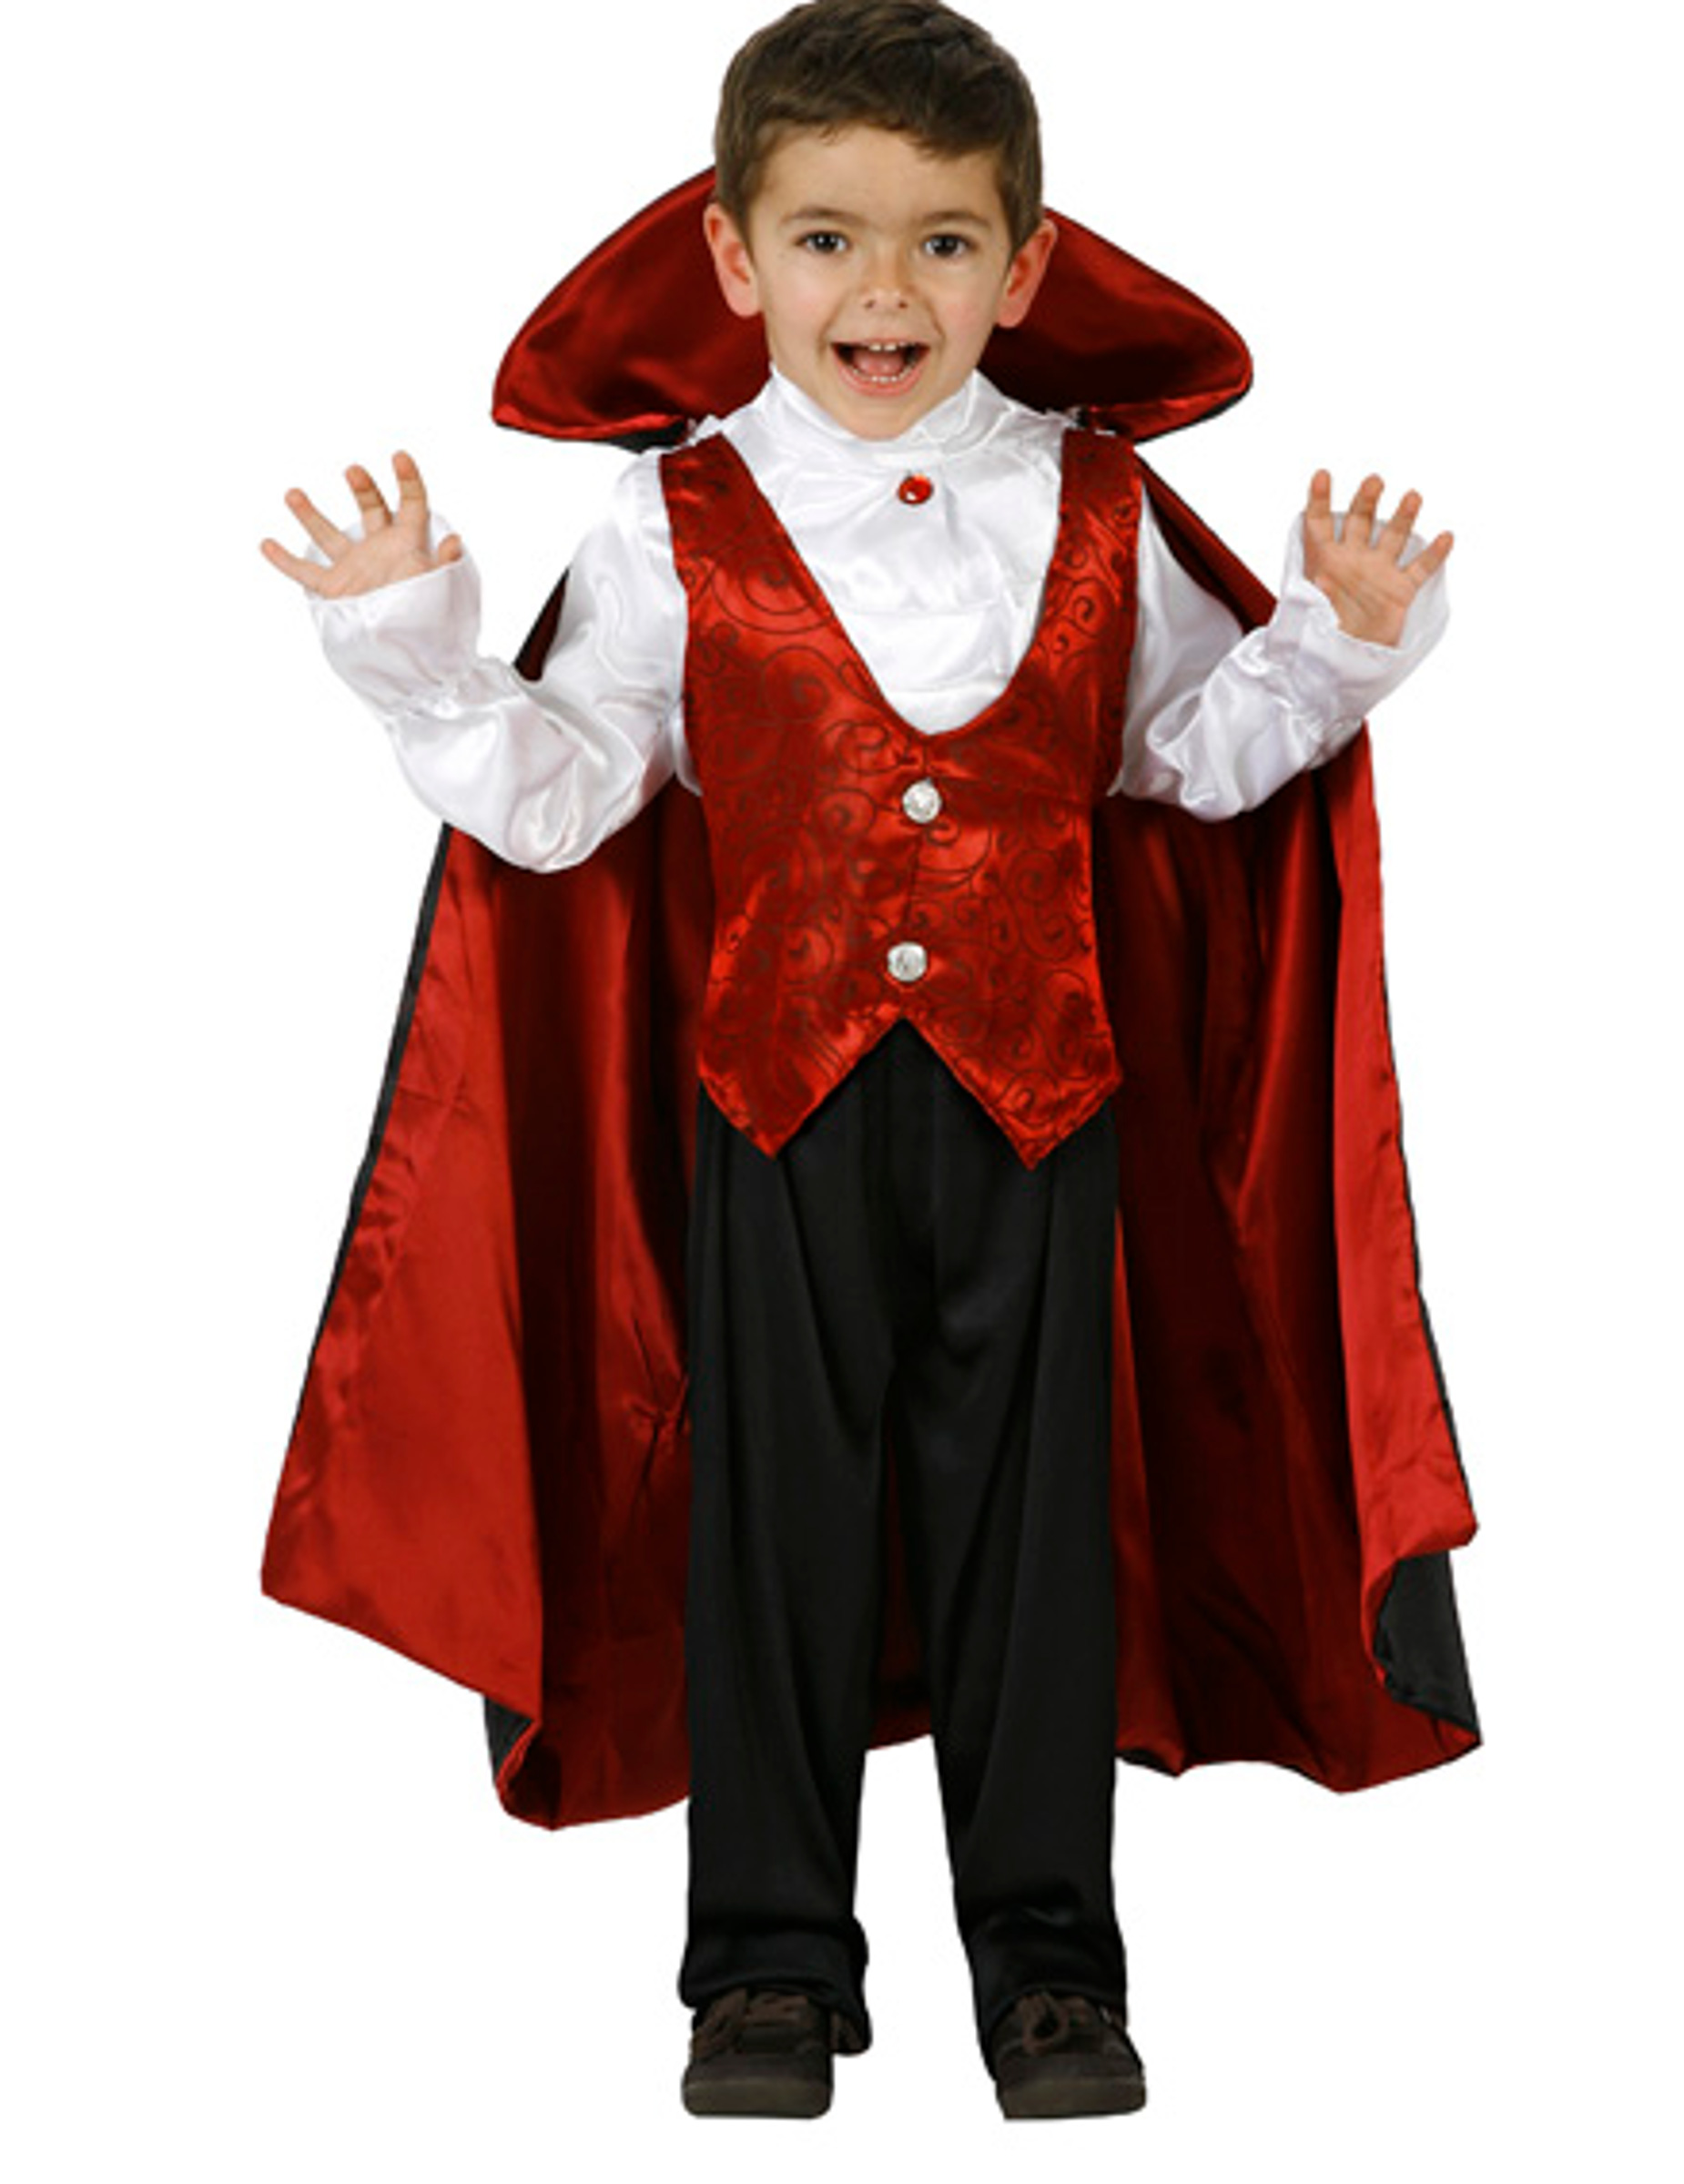 Costume da conte vampiro per bambino halloween  Costumi bambini 98cdef931c3b